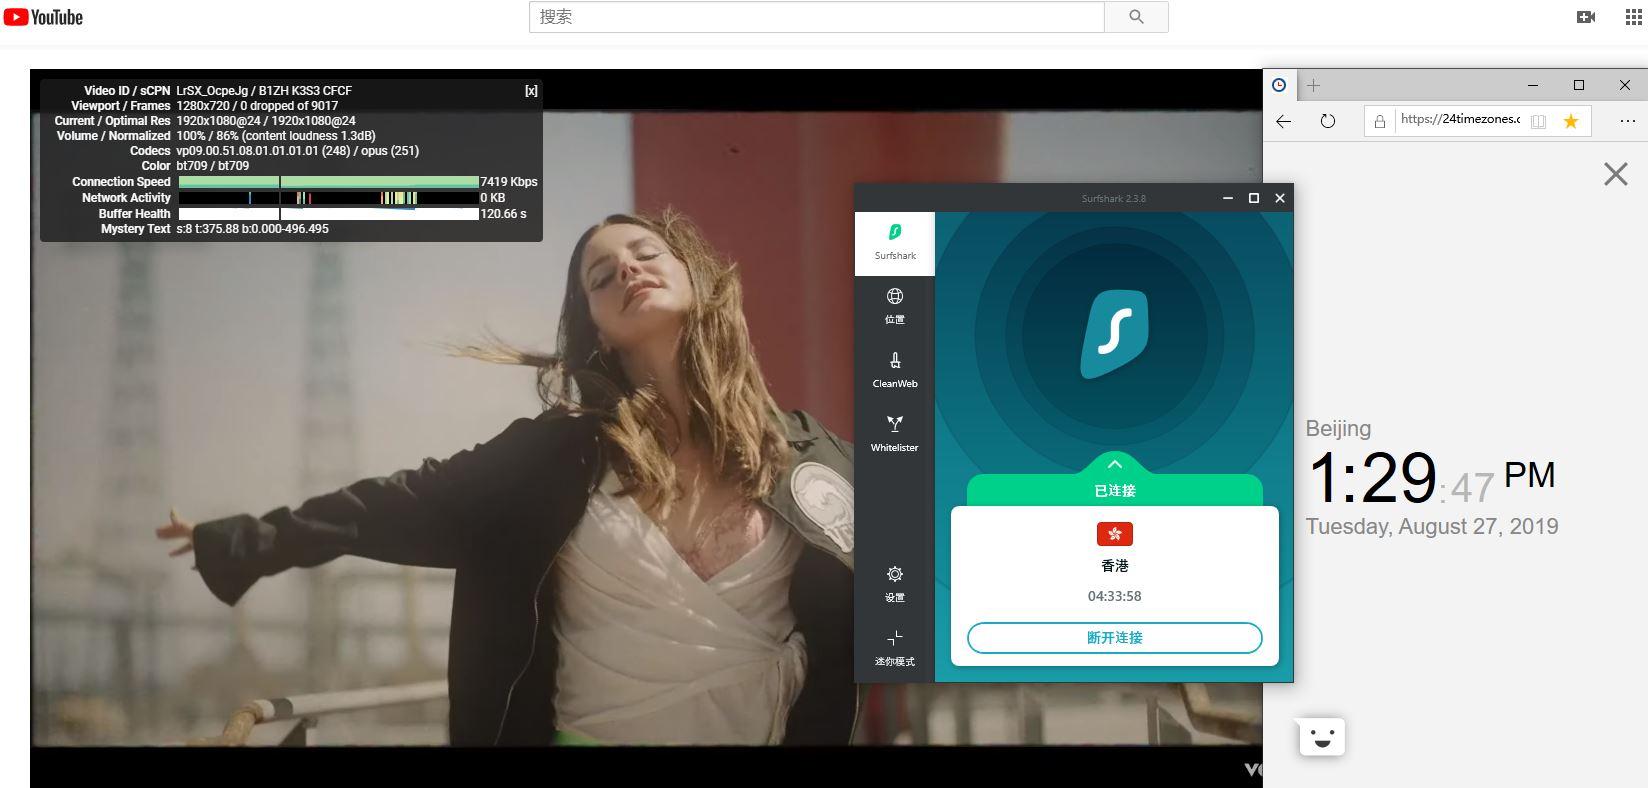 windows surfsharkVPN 香港服务器 中国VPN翻墙 科学上网 YouTube测速-20190827